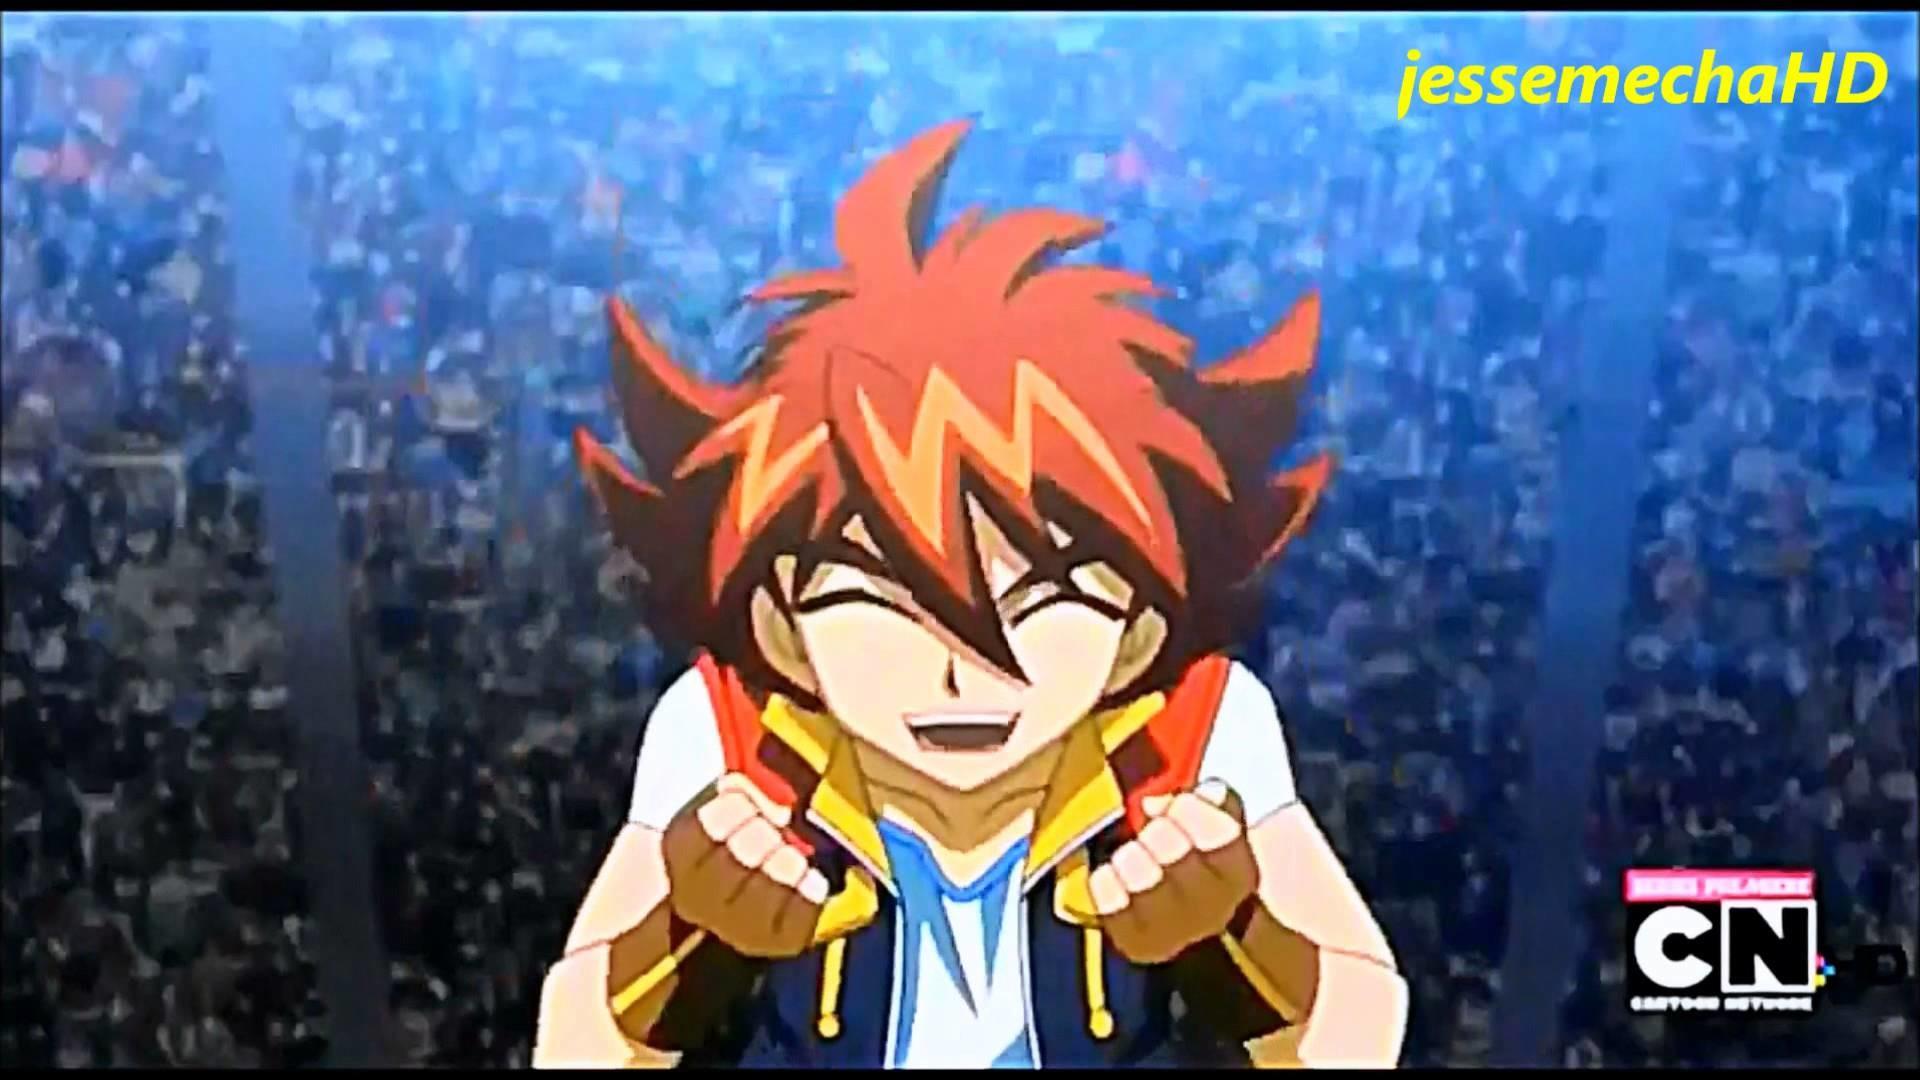 Watch Beyblade Anime 18 Anime Background. Watch Beyblade Anime 18 Anime  Background